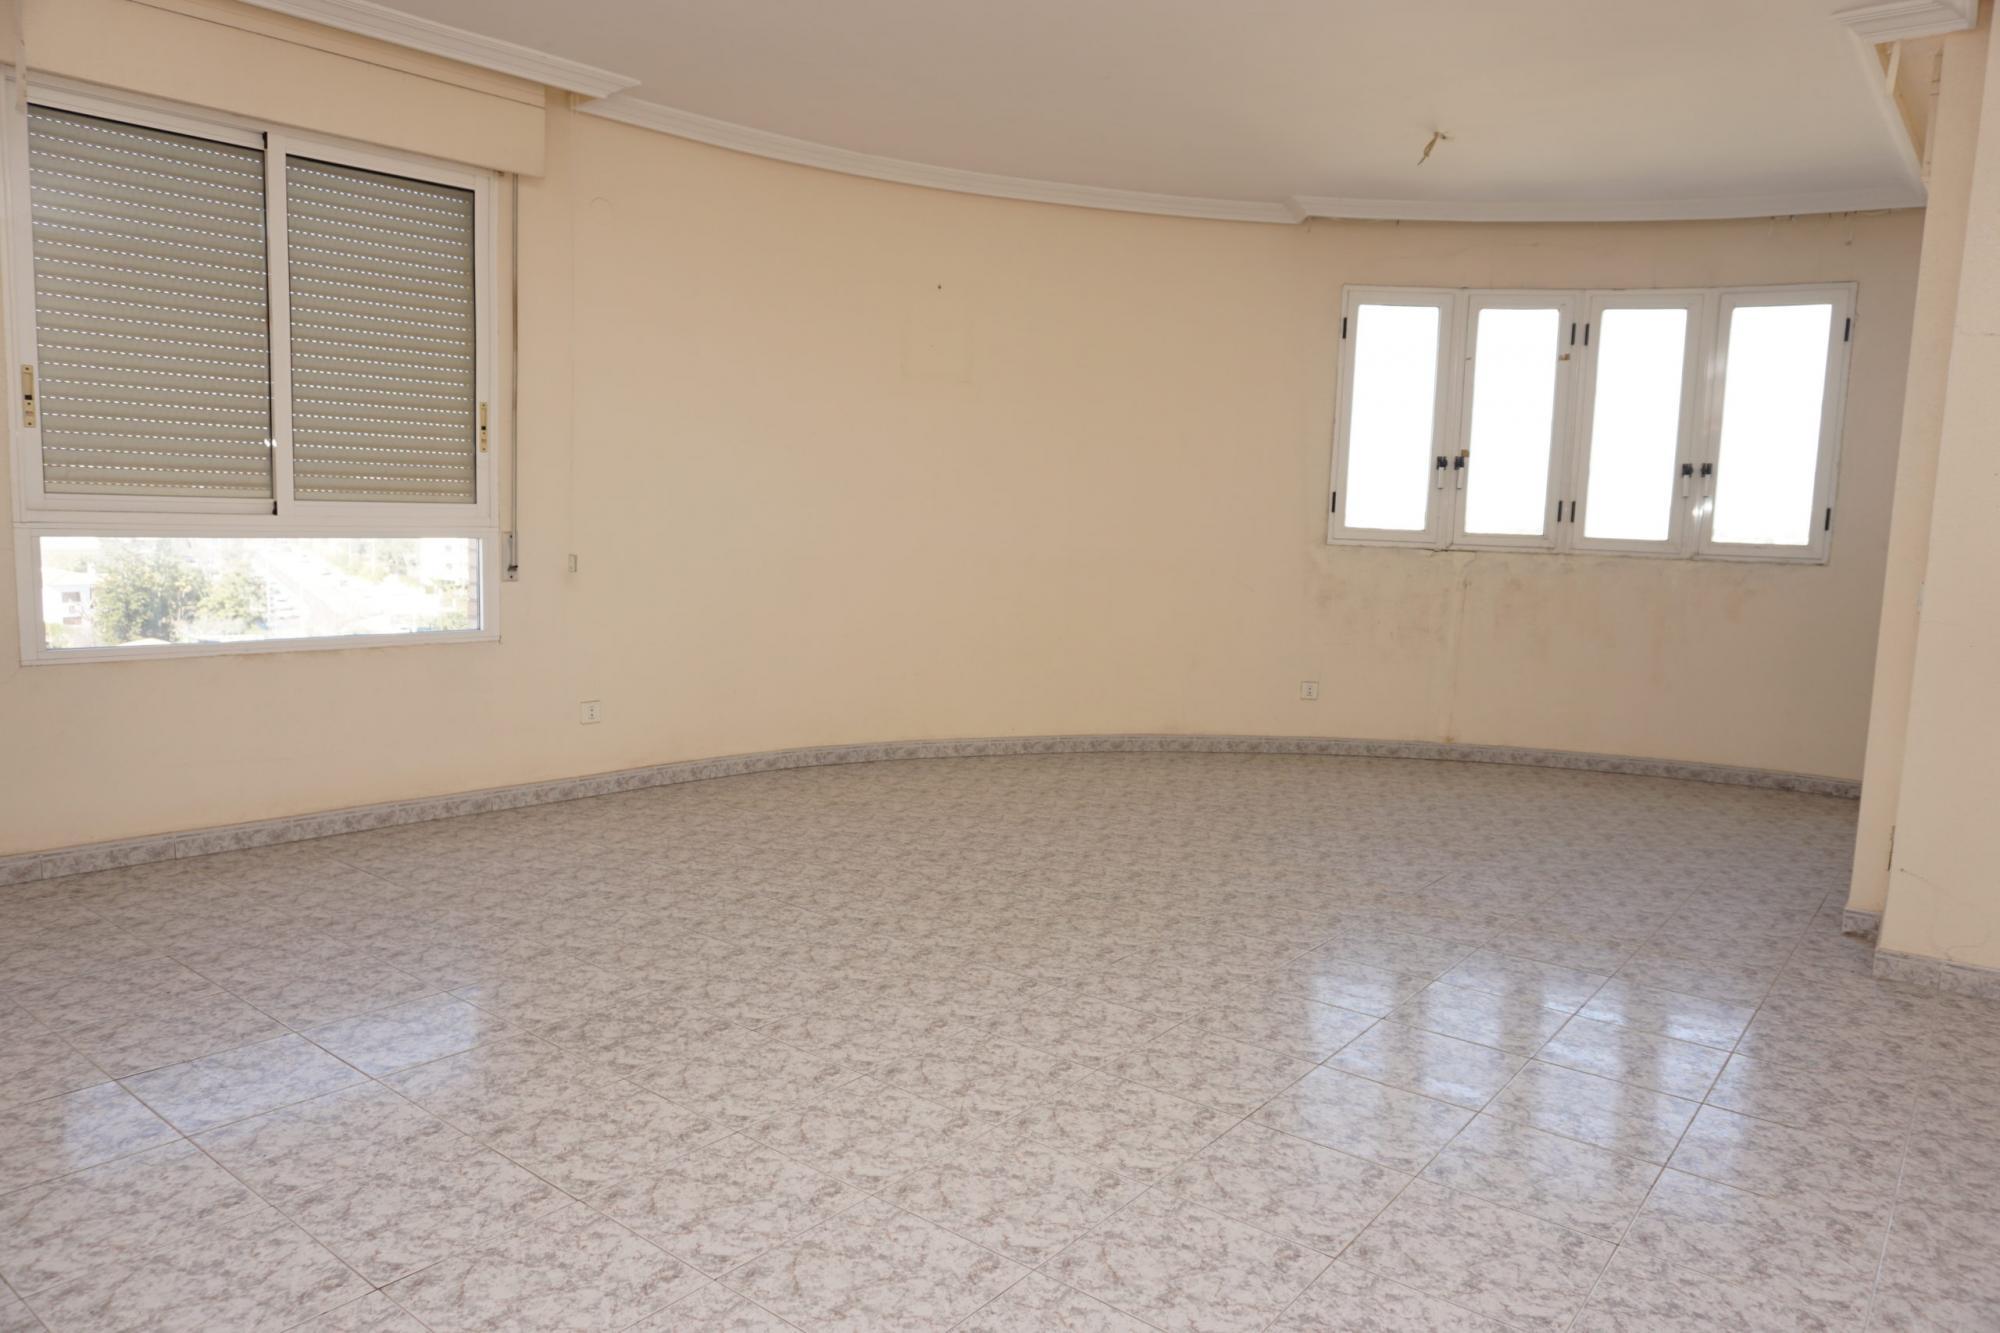 Venta de piso en Burriana (Castellón) zona Puerto